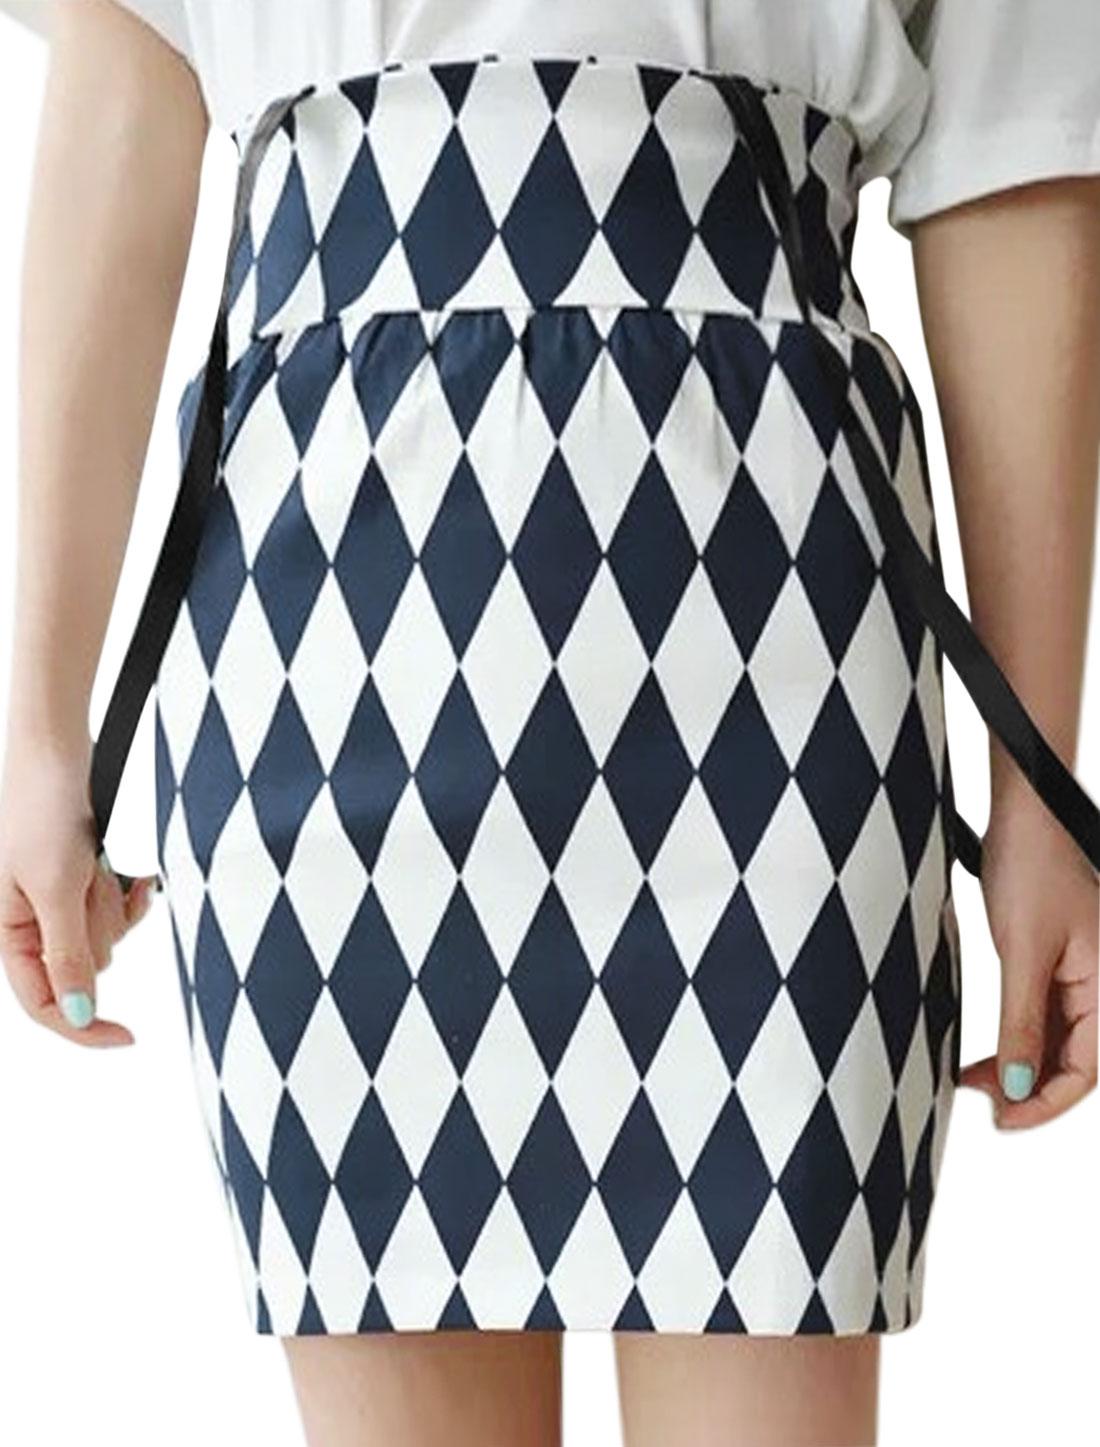 Ladies High Waist Argyle Prints Mini Suspender Skirt Navy Blue XS